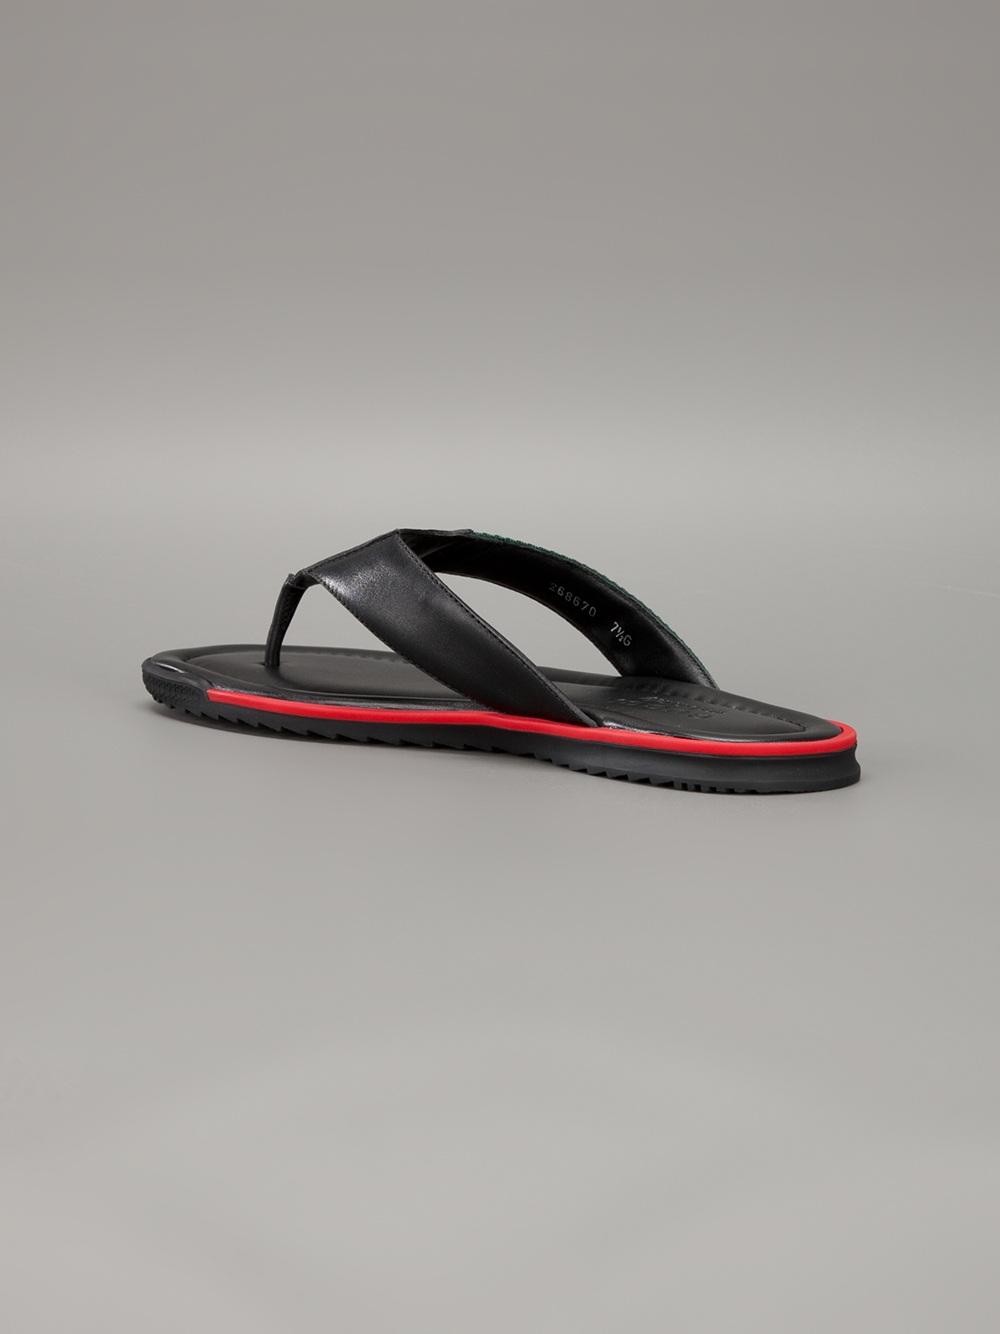 Gucci Stripe Detail Flip Flops In Black For Men - Lyst-7384